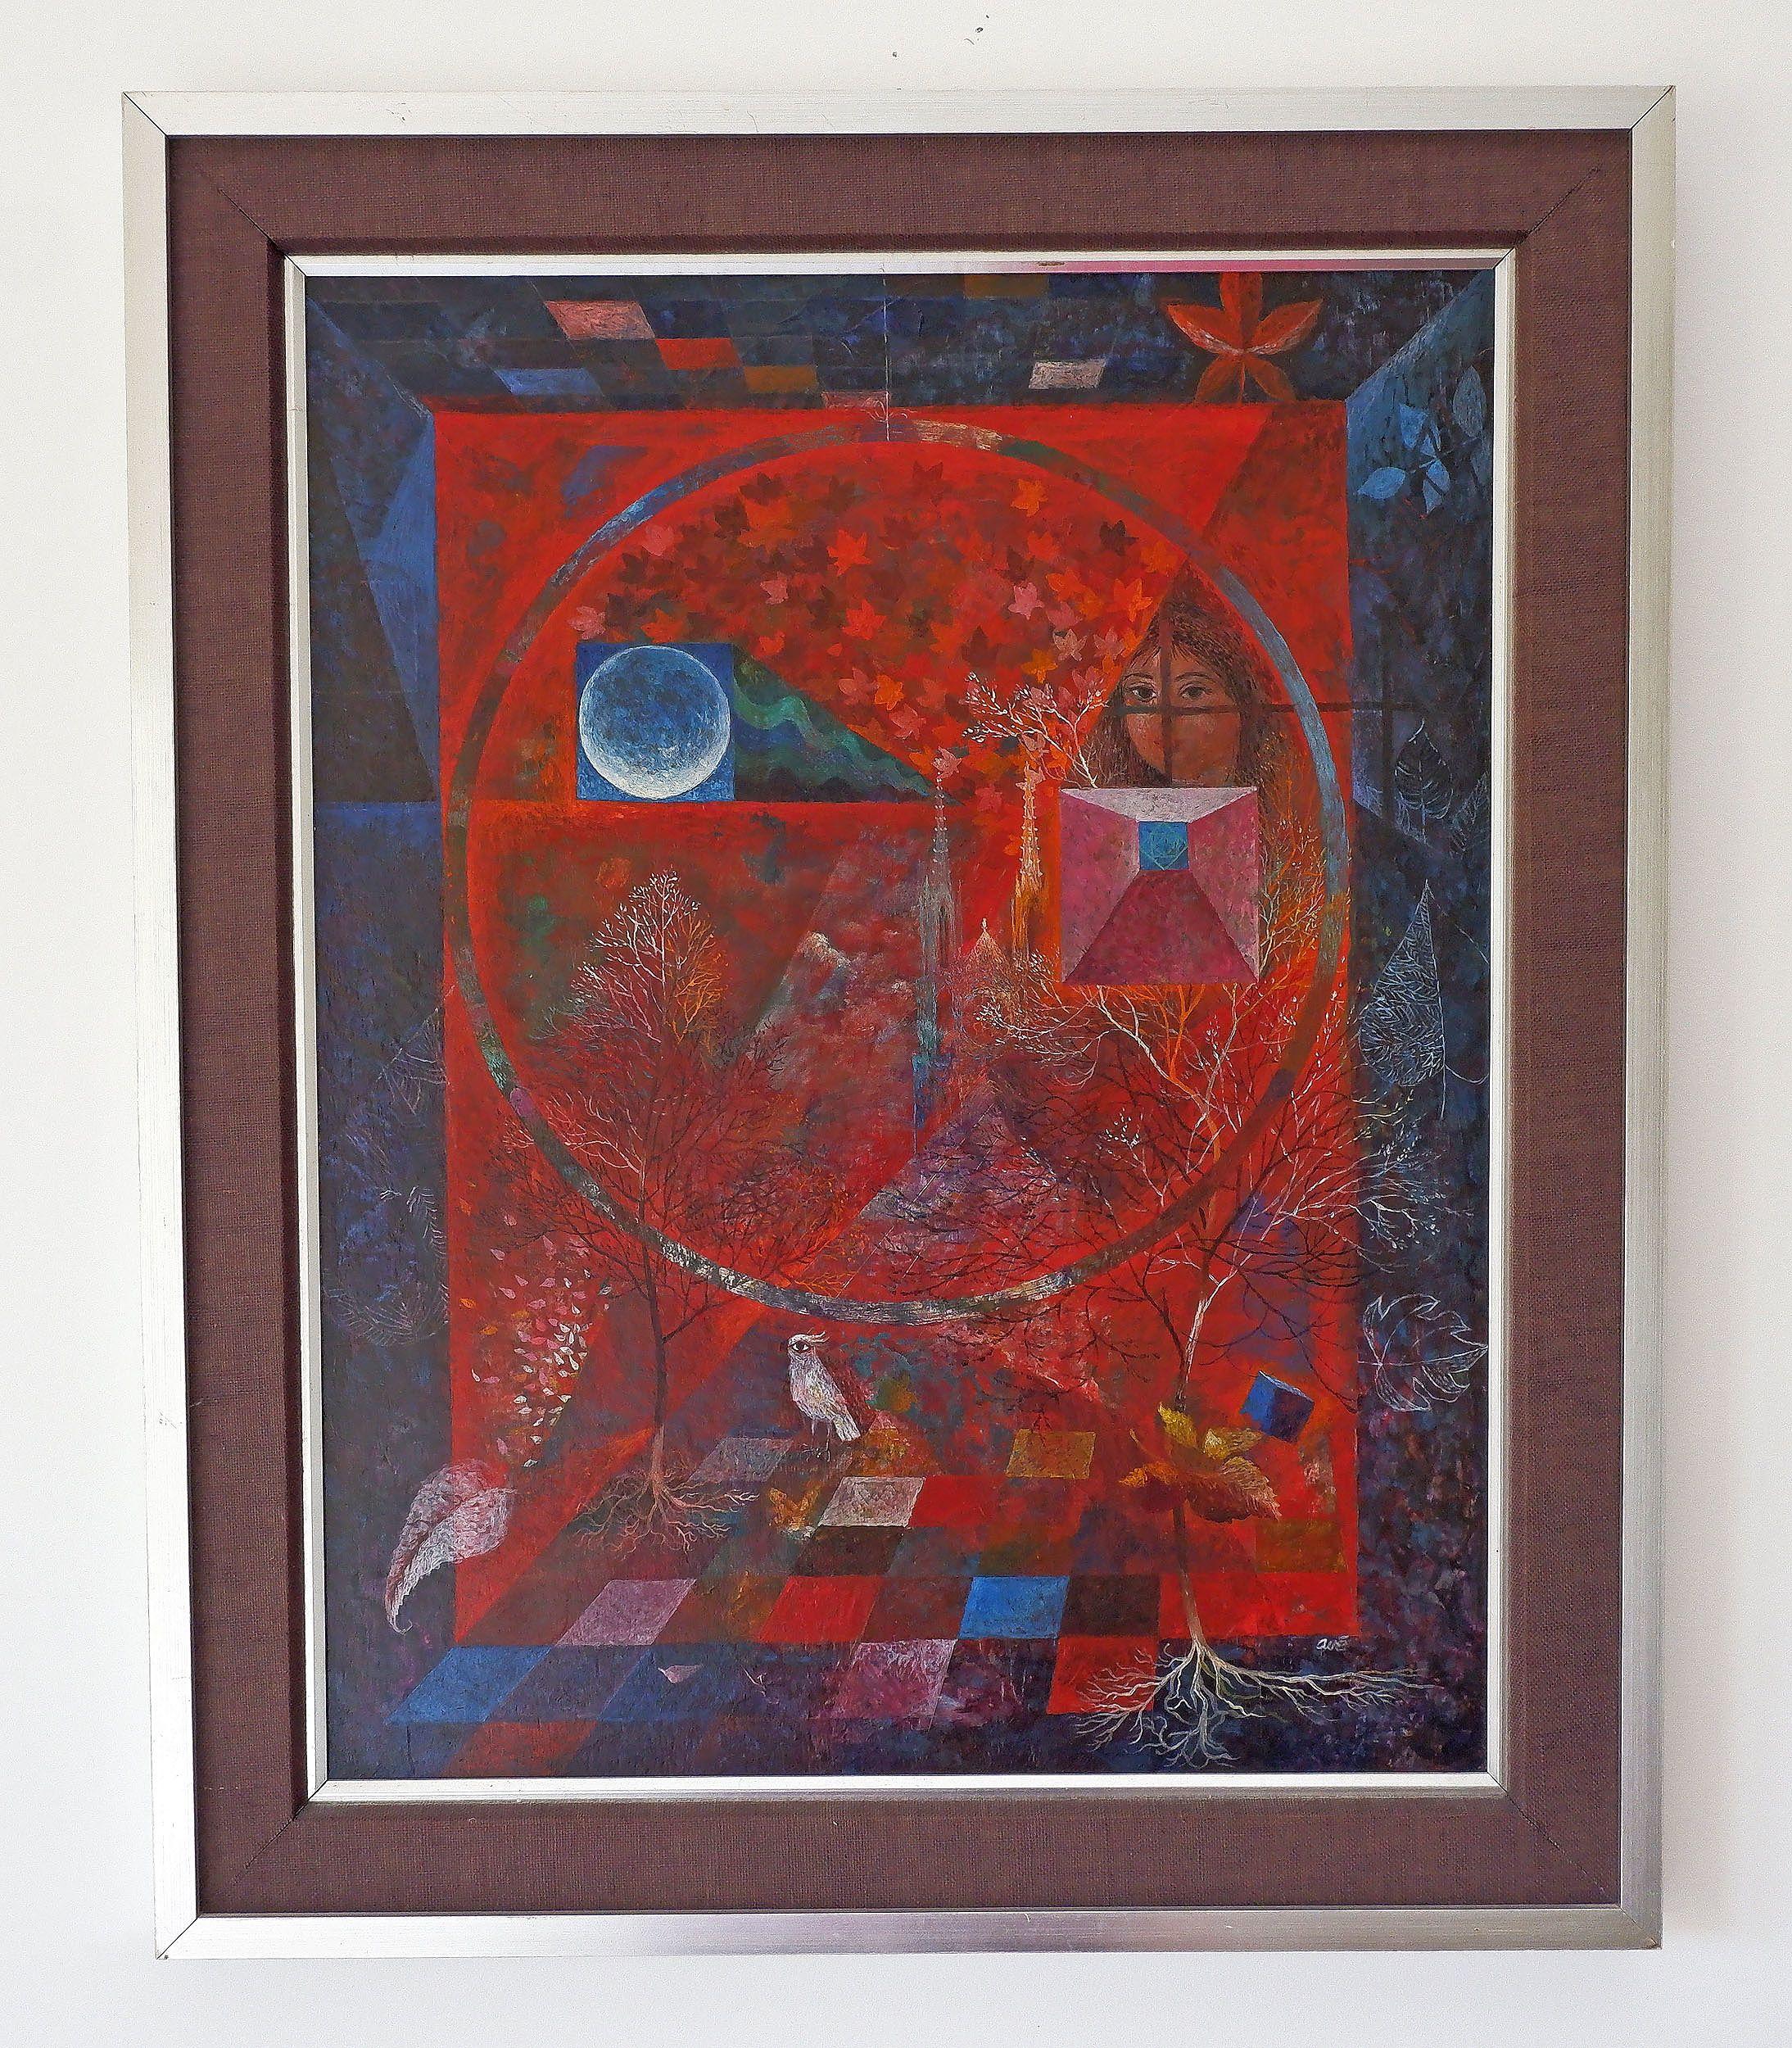 'Aart Van Ewijk (1912-1992), The Four Seasons, Oil on Board'